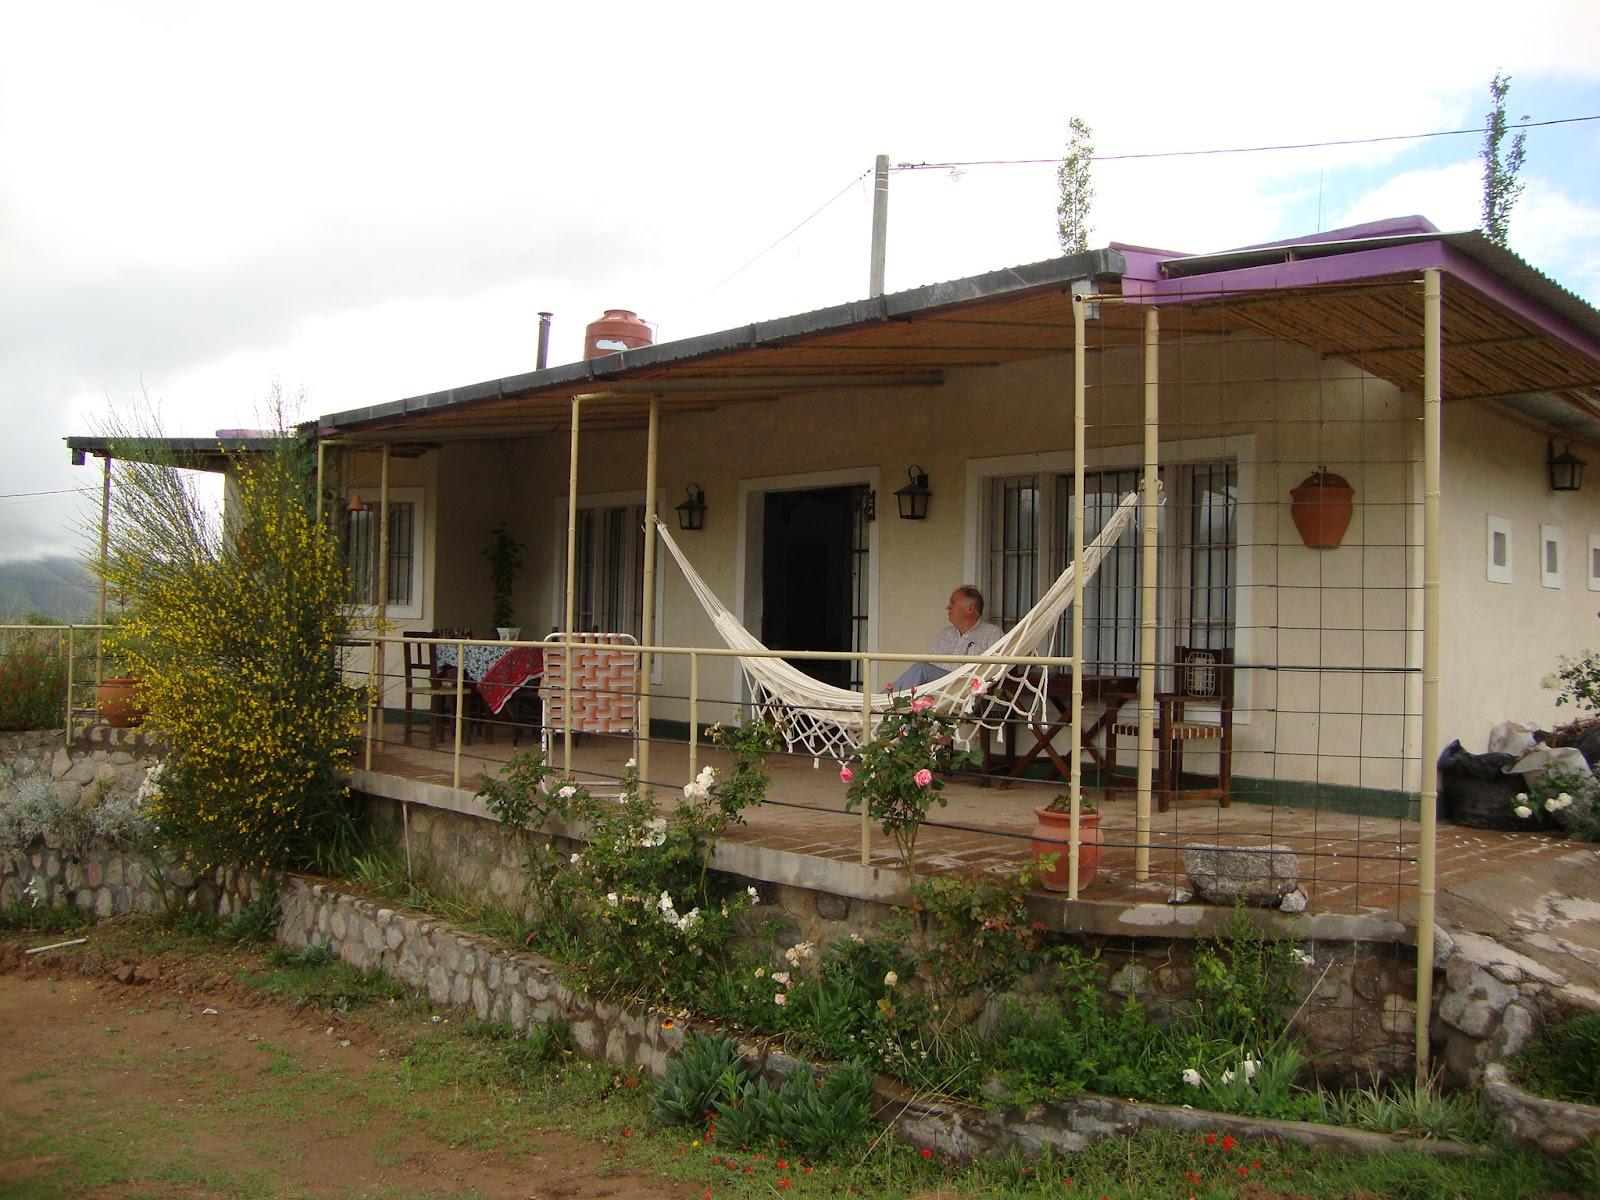 Alquiler de casa en tafi del valle tucum n im genes - Alquiler casas parets del valles ...